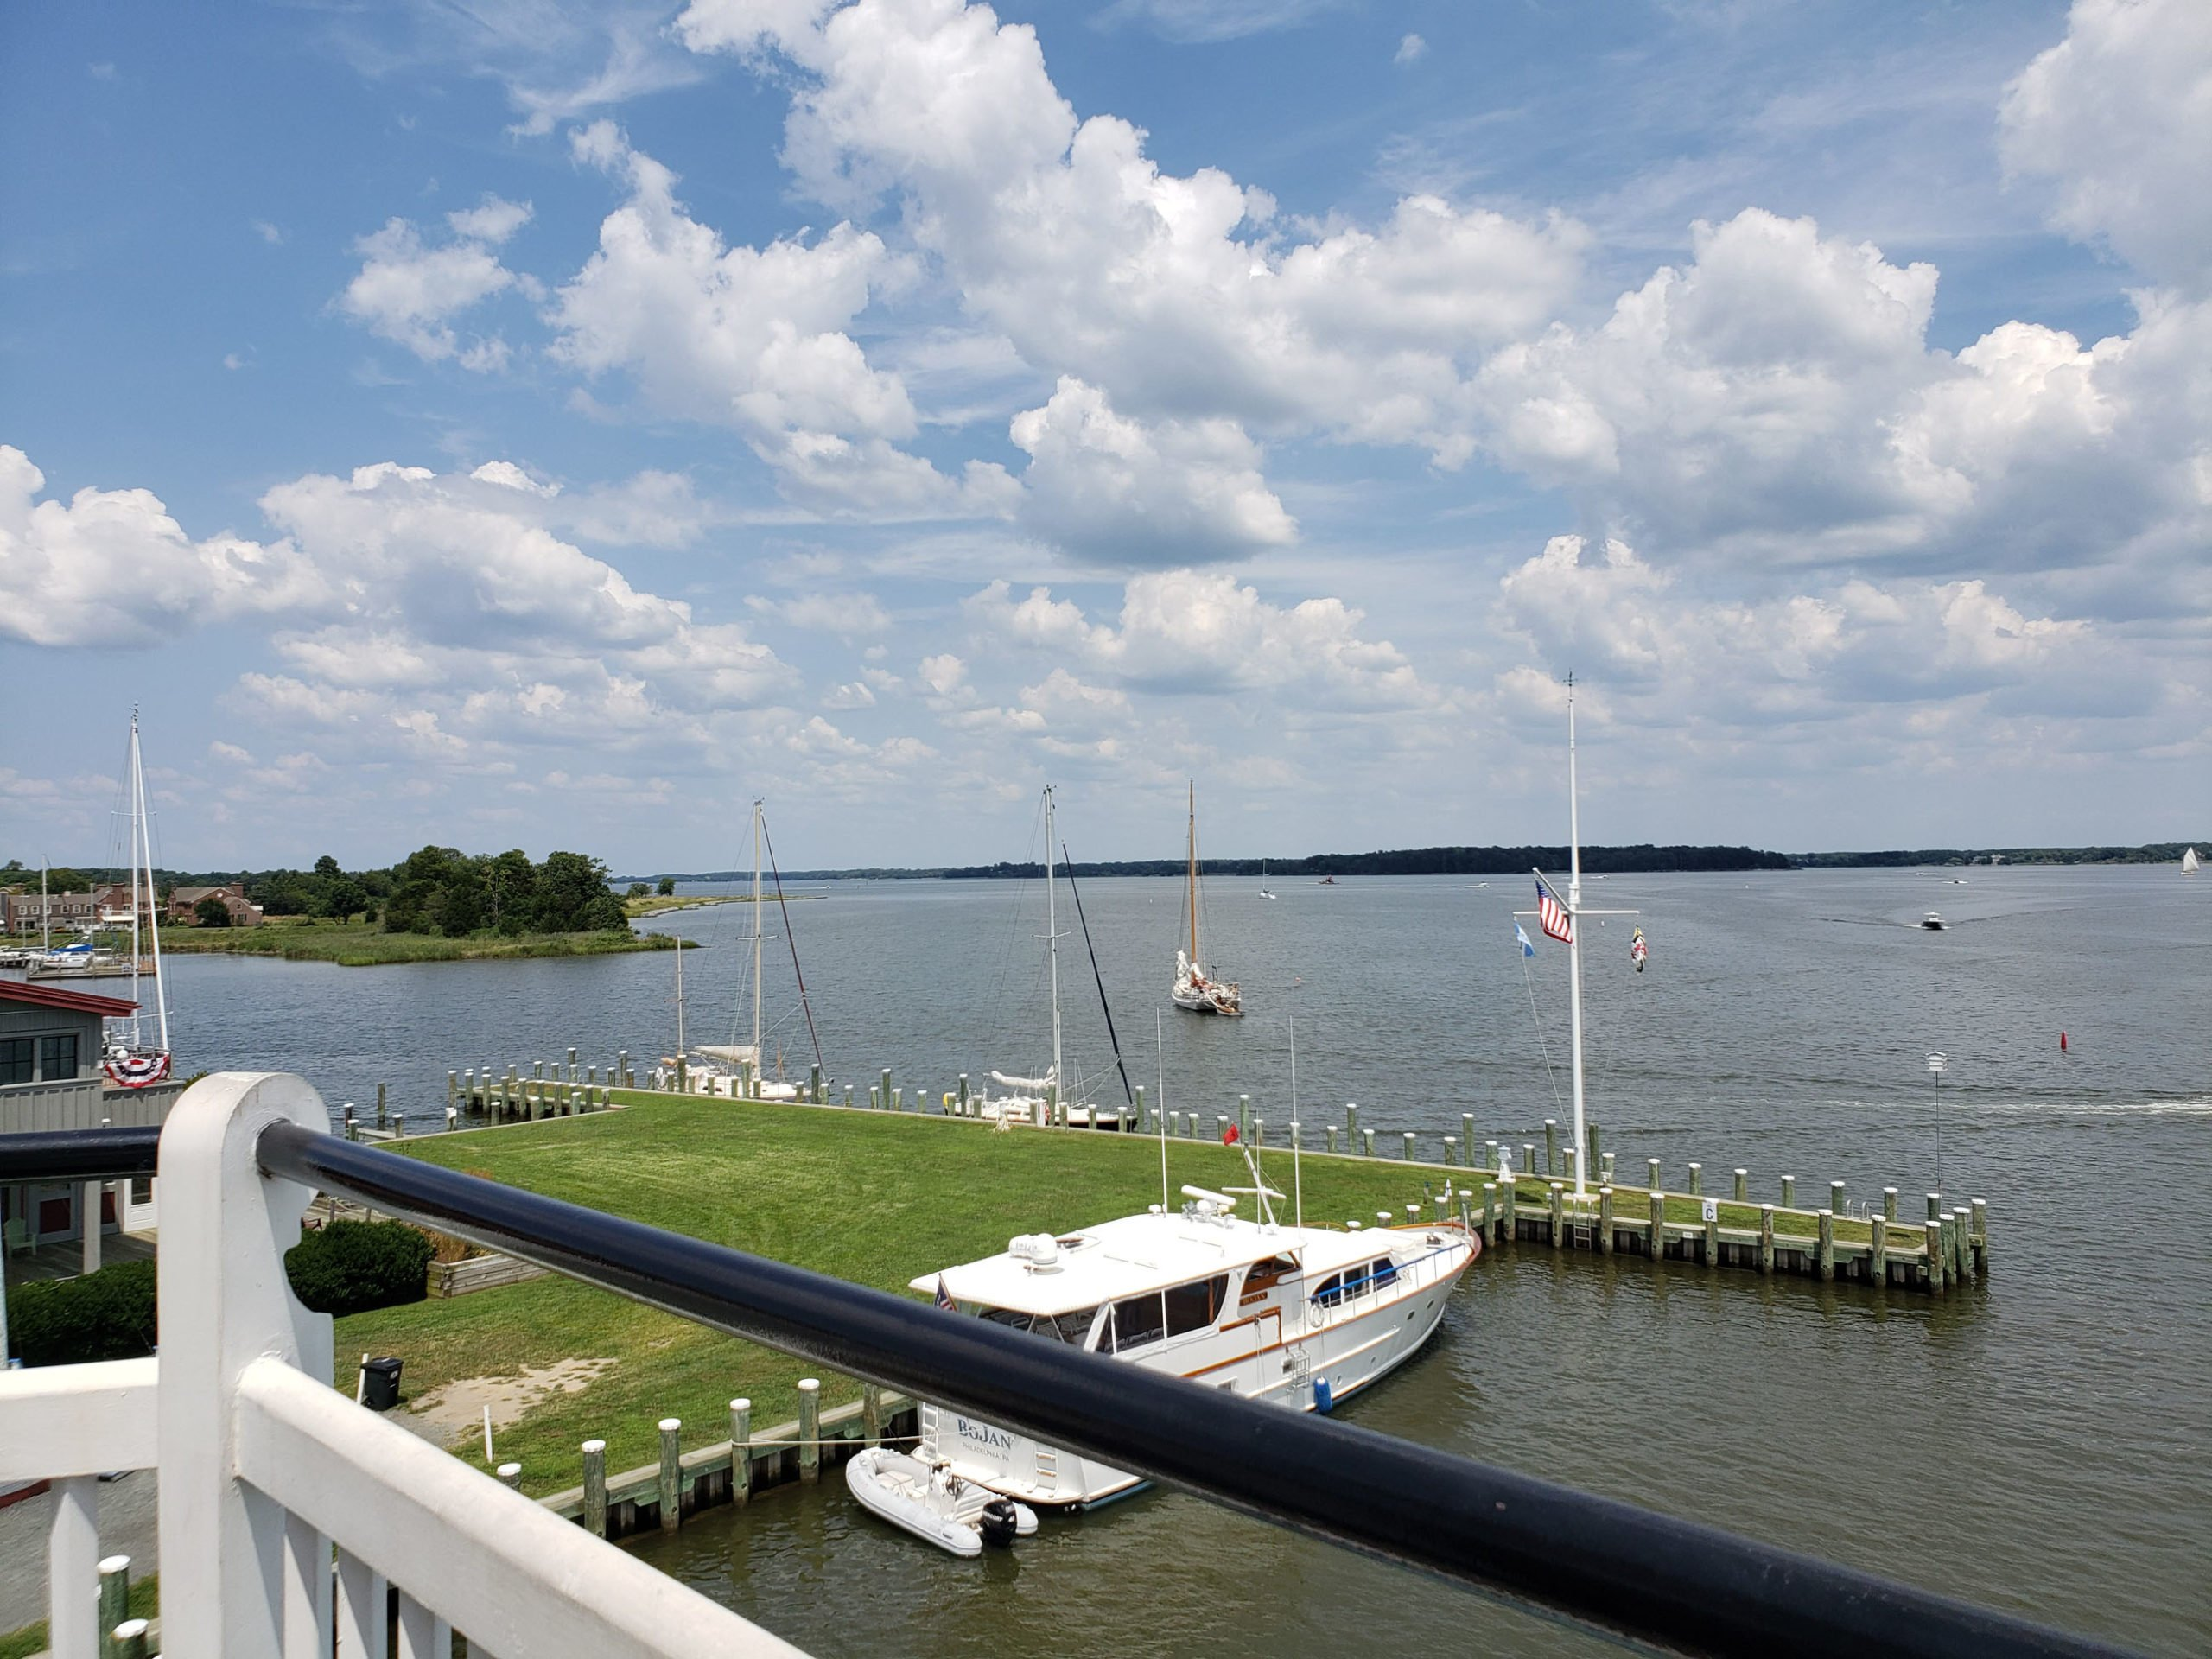 view of the Chesapeake Bay